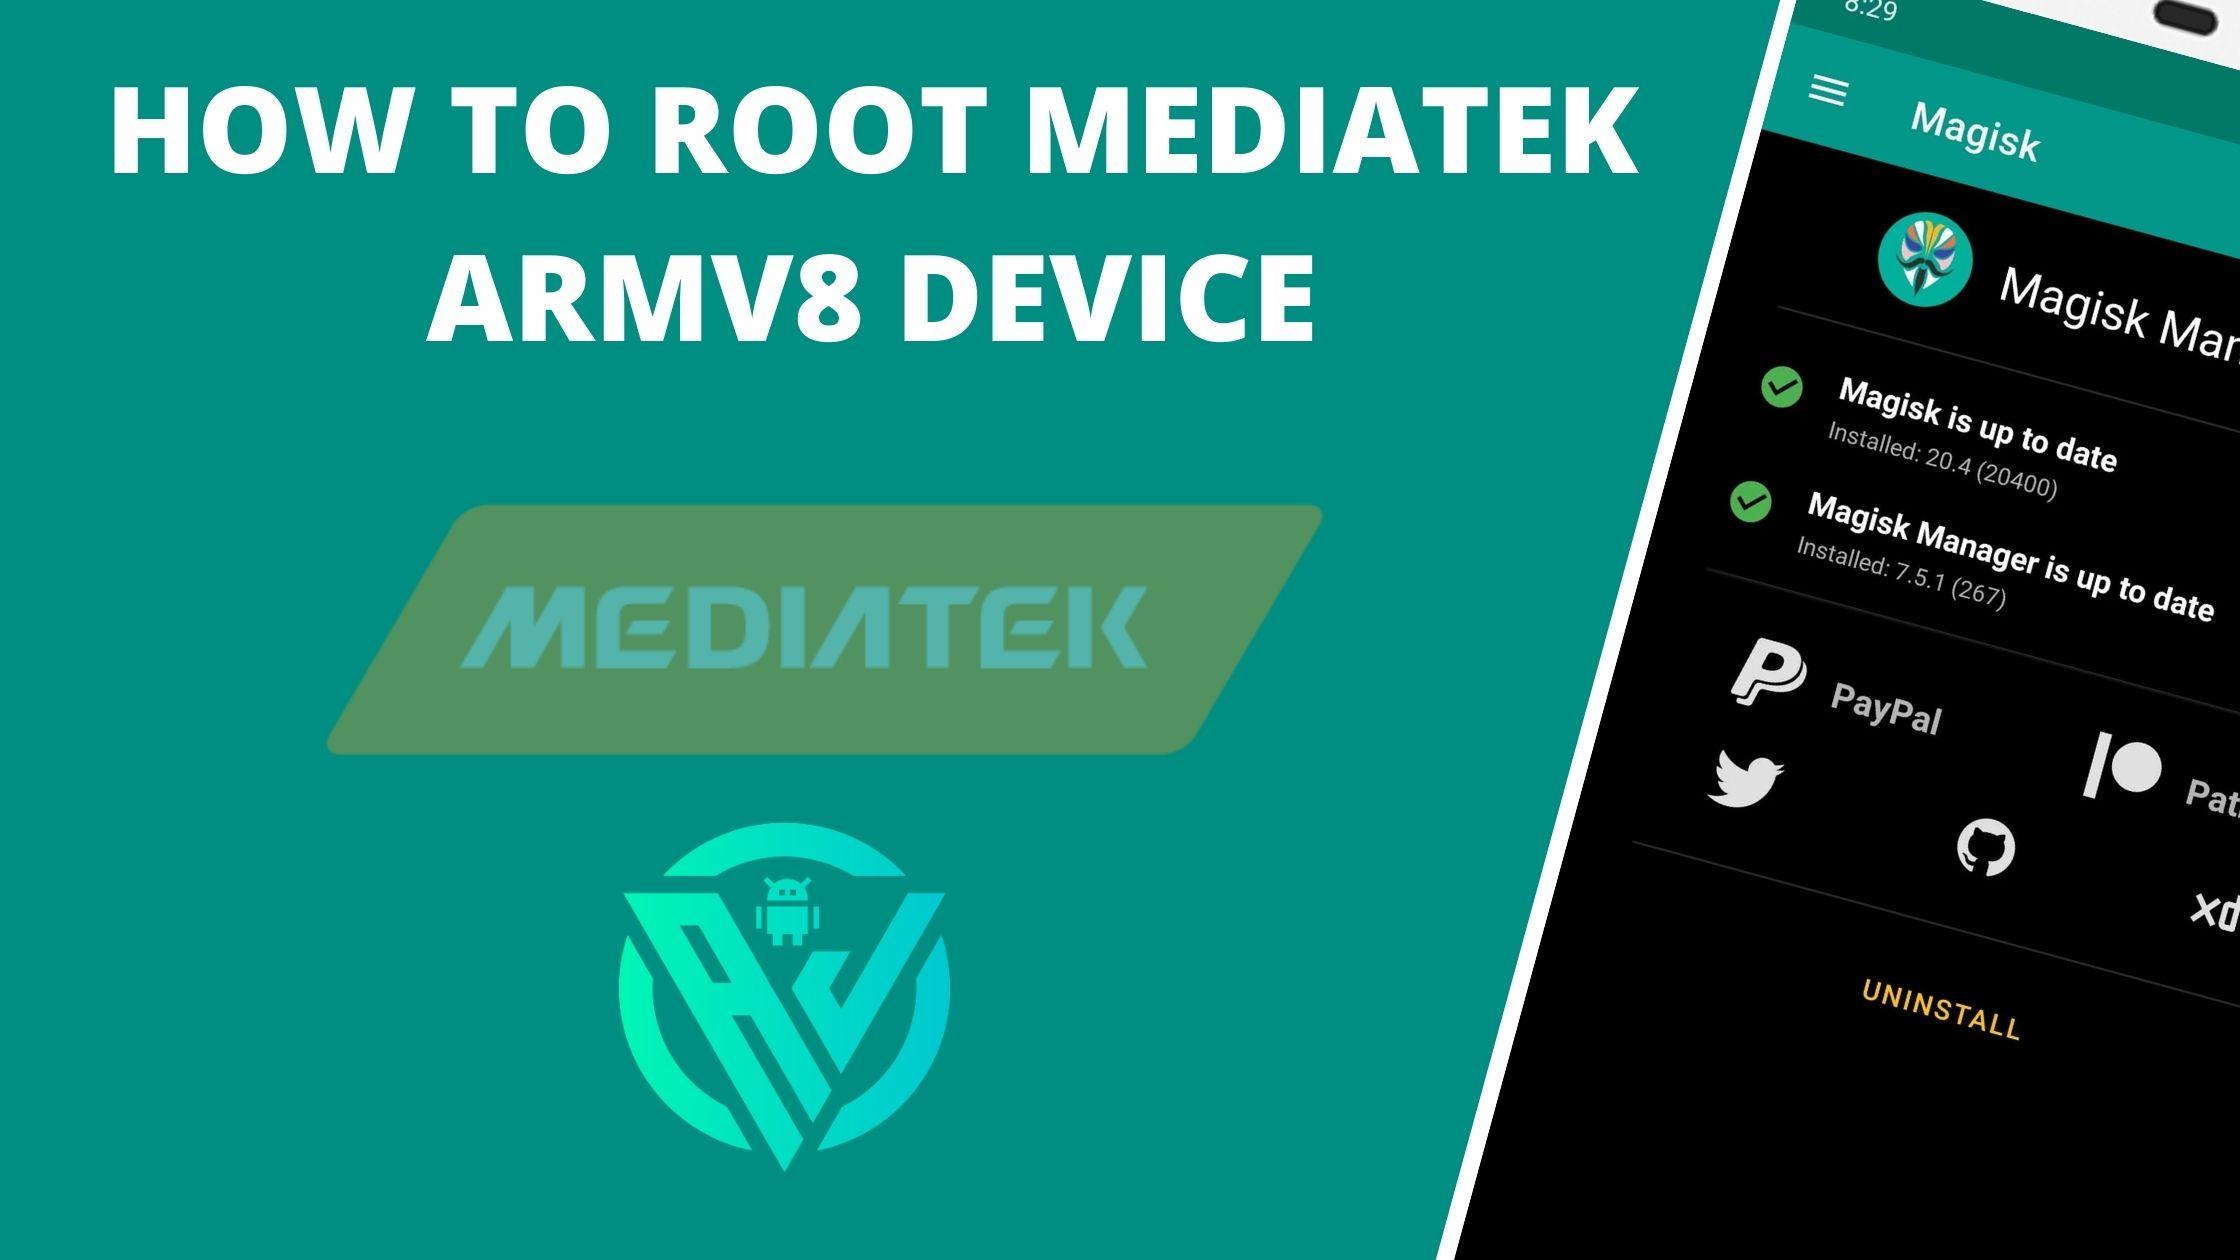 root mediatek armv8 device